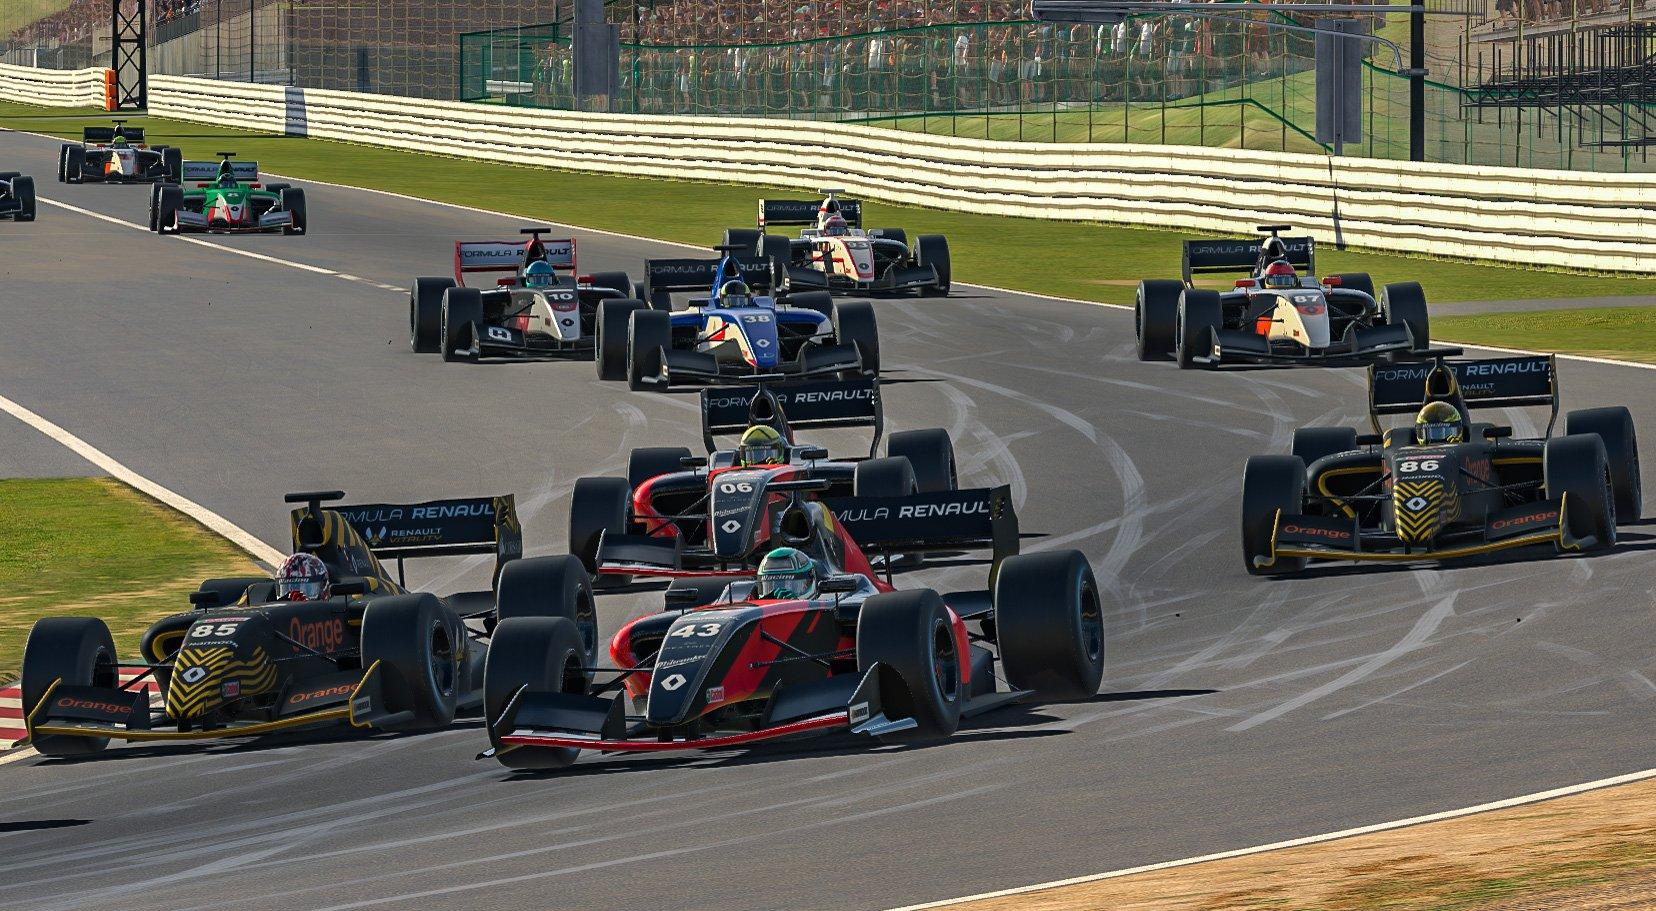 Cem Bolukbasi Formula Renault